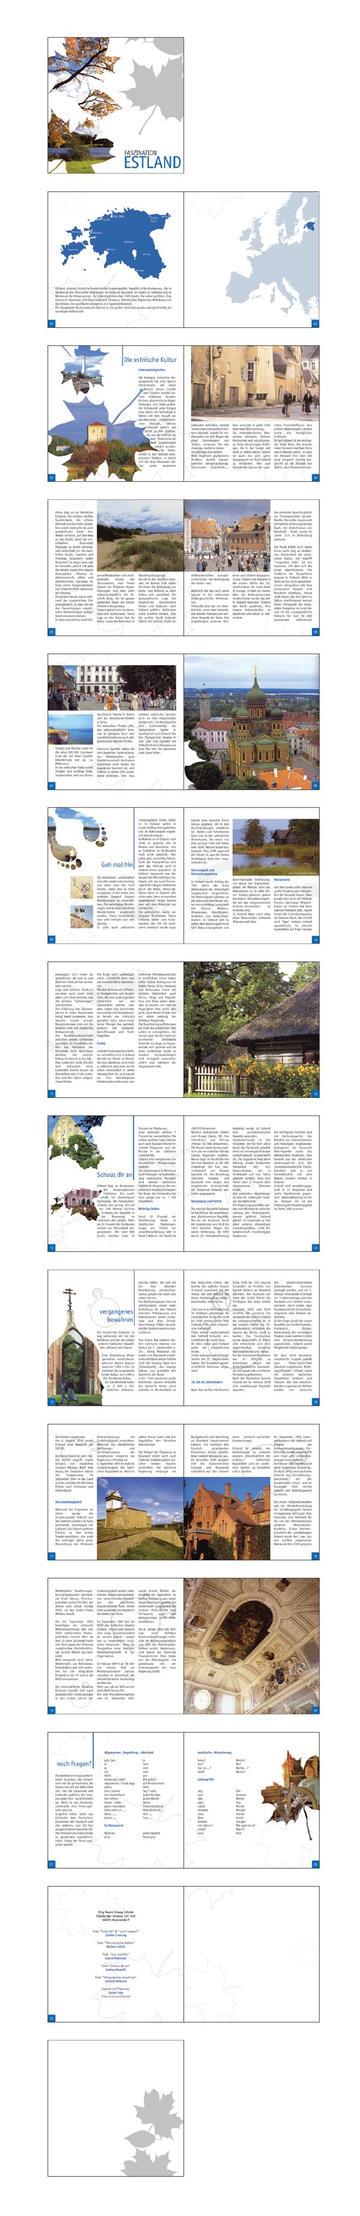 Brochure Estoria by wethepe0ple